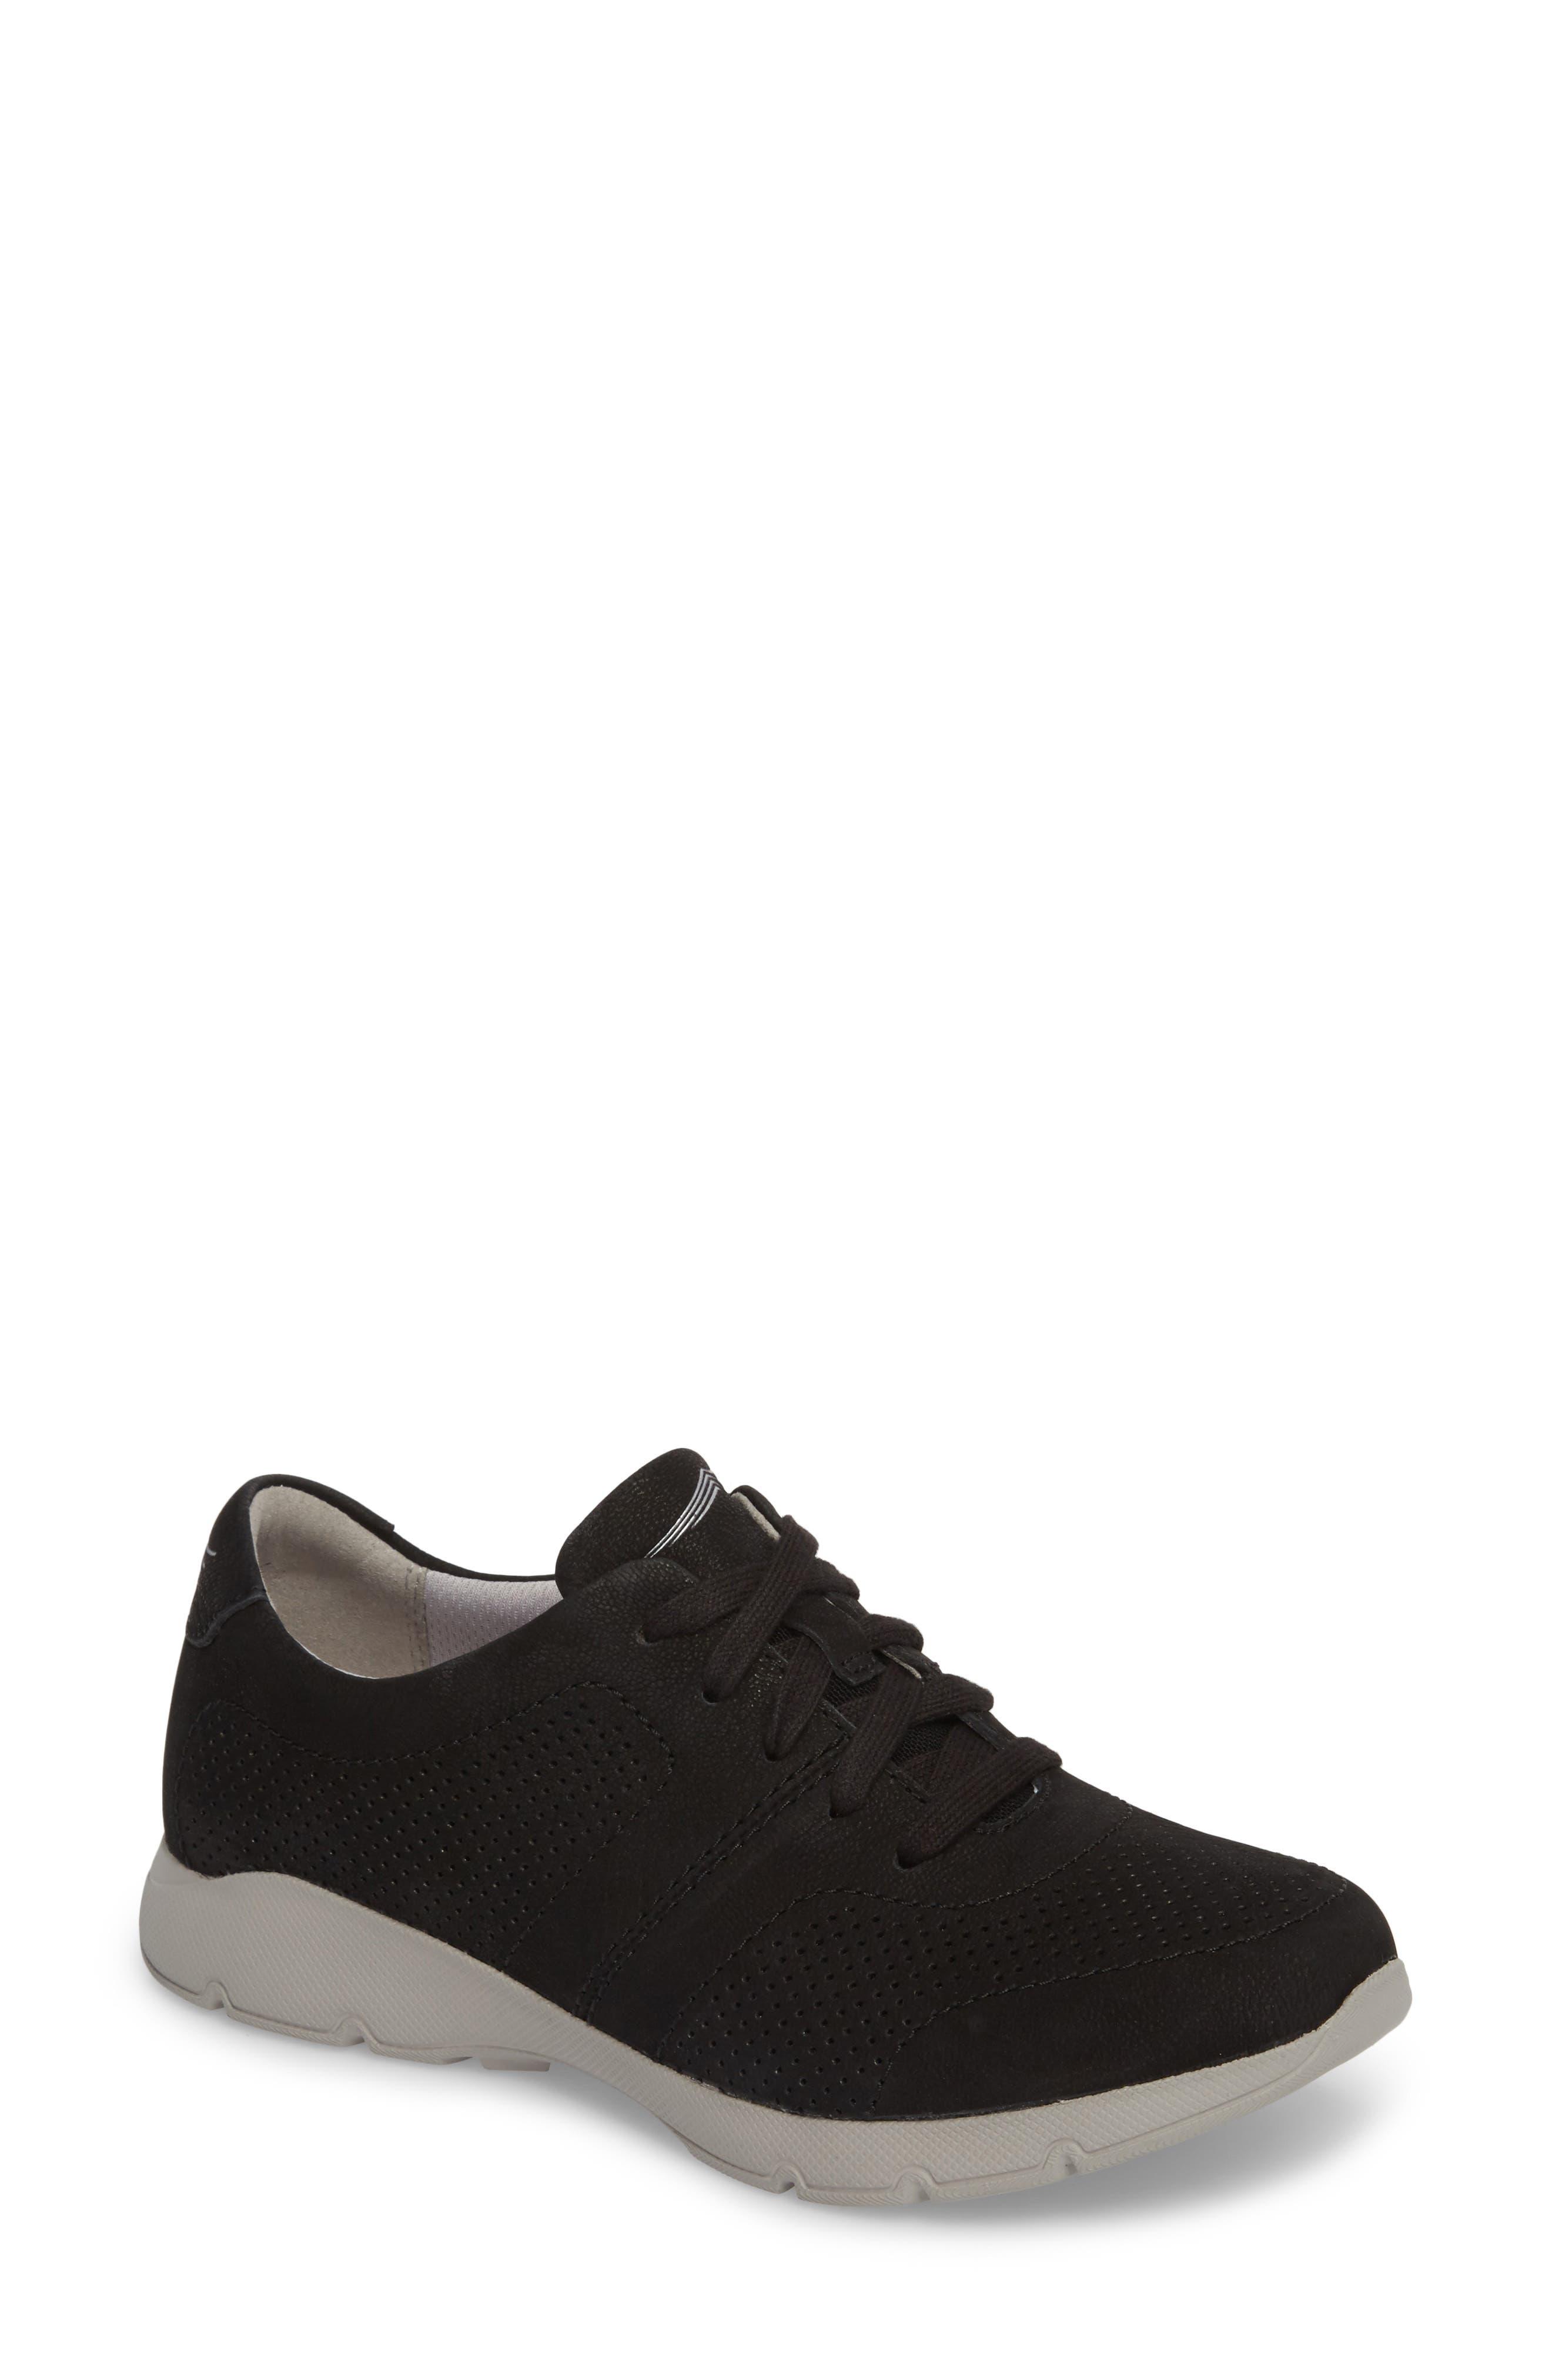 Alissa Sneaker,                             Main thumbnail 1, color,                             001